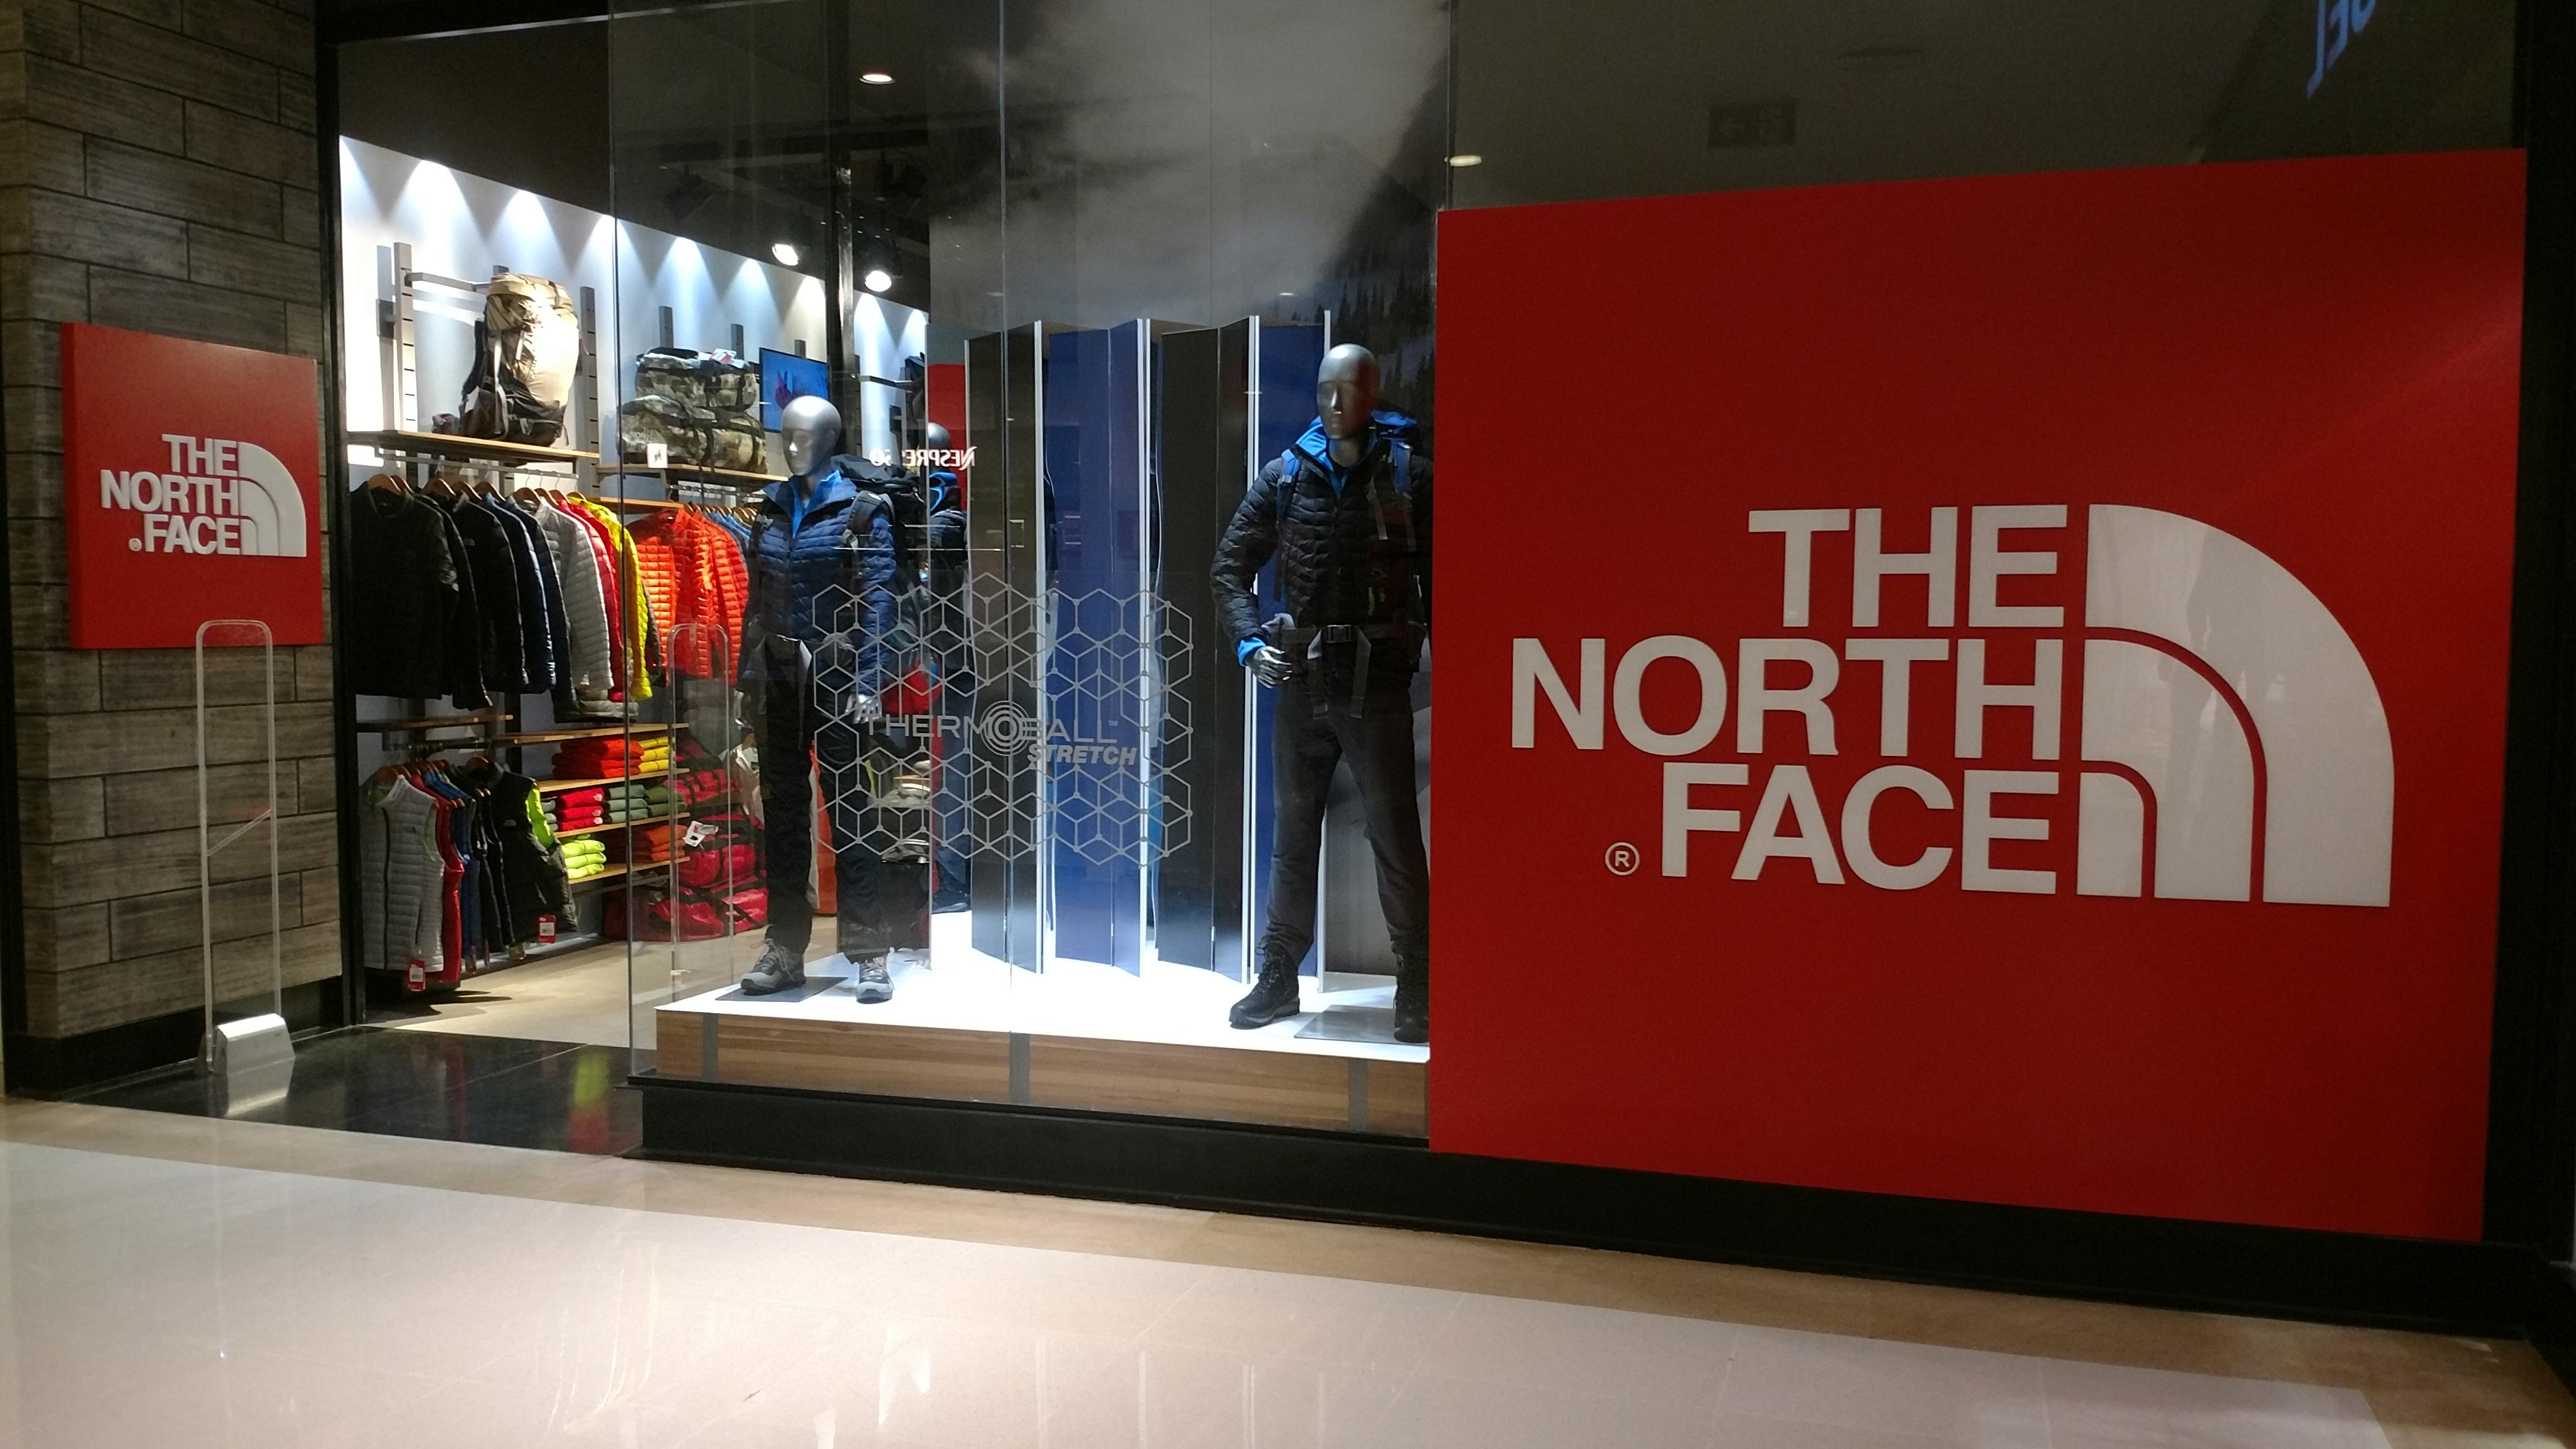 onde comprar north face em curitiba